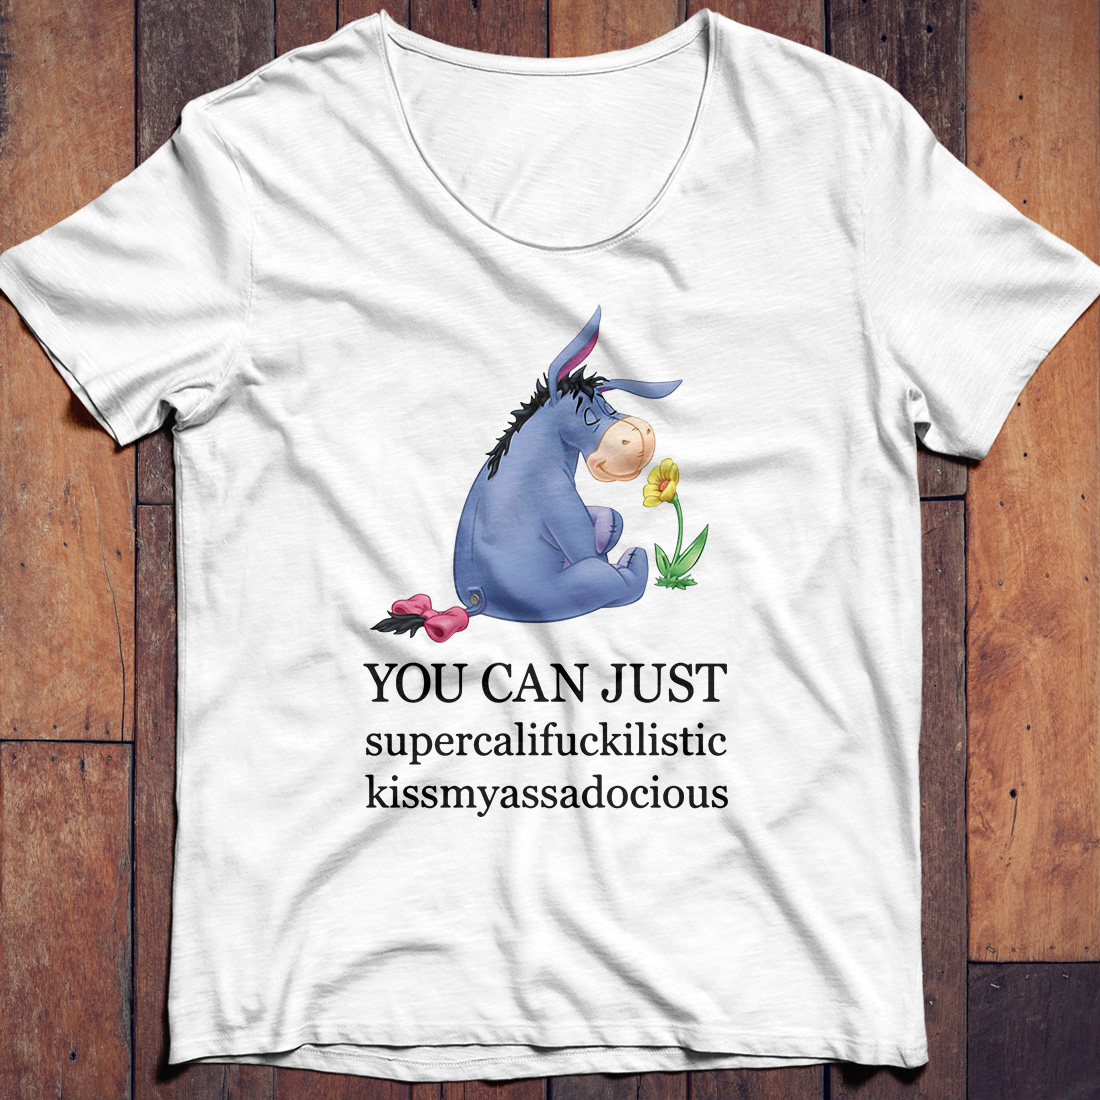 Eeyore you can just supercalifuckilistic kissmyassadocious shirt